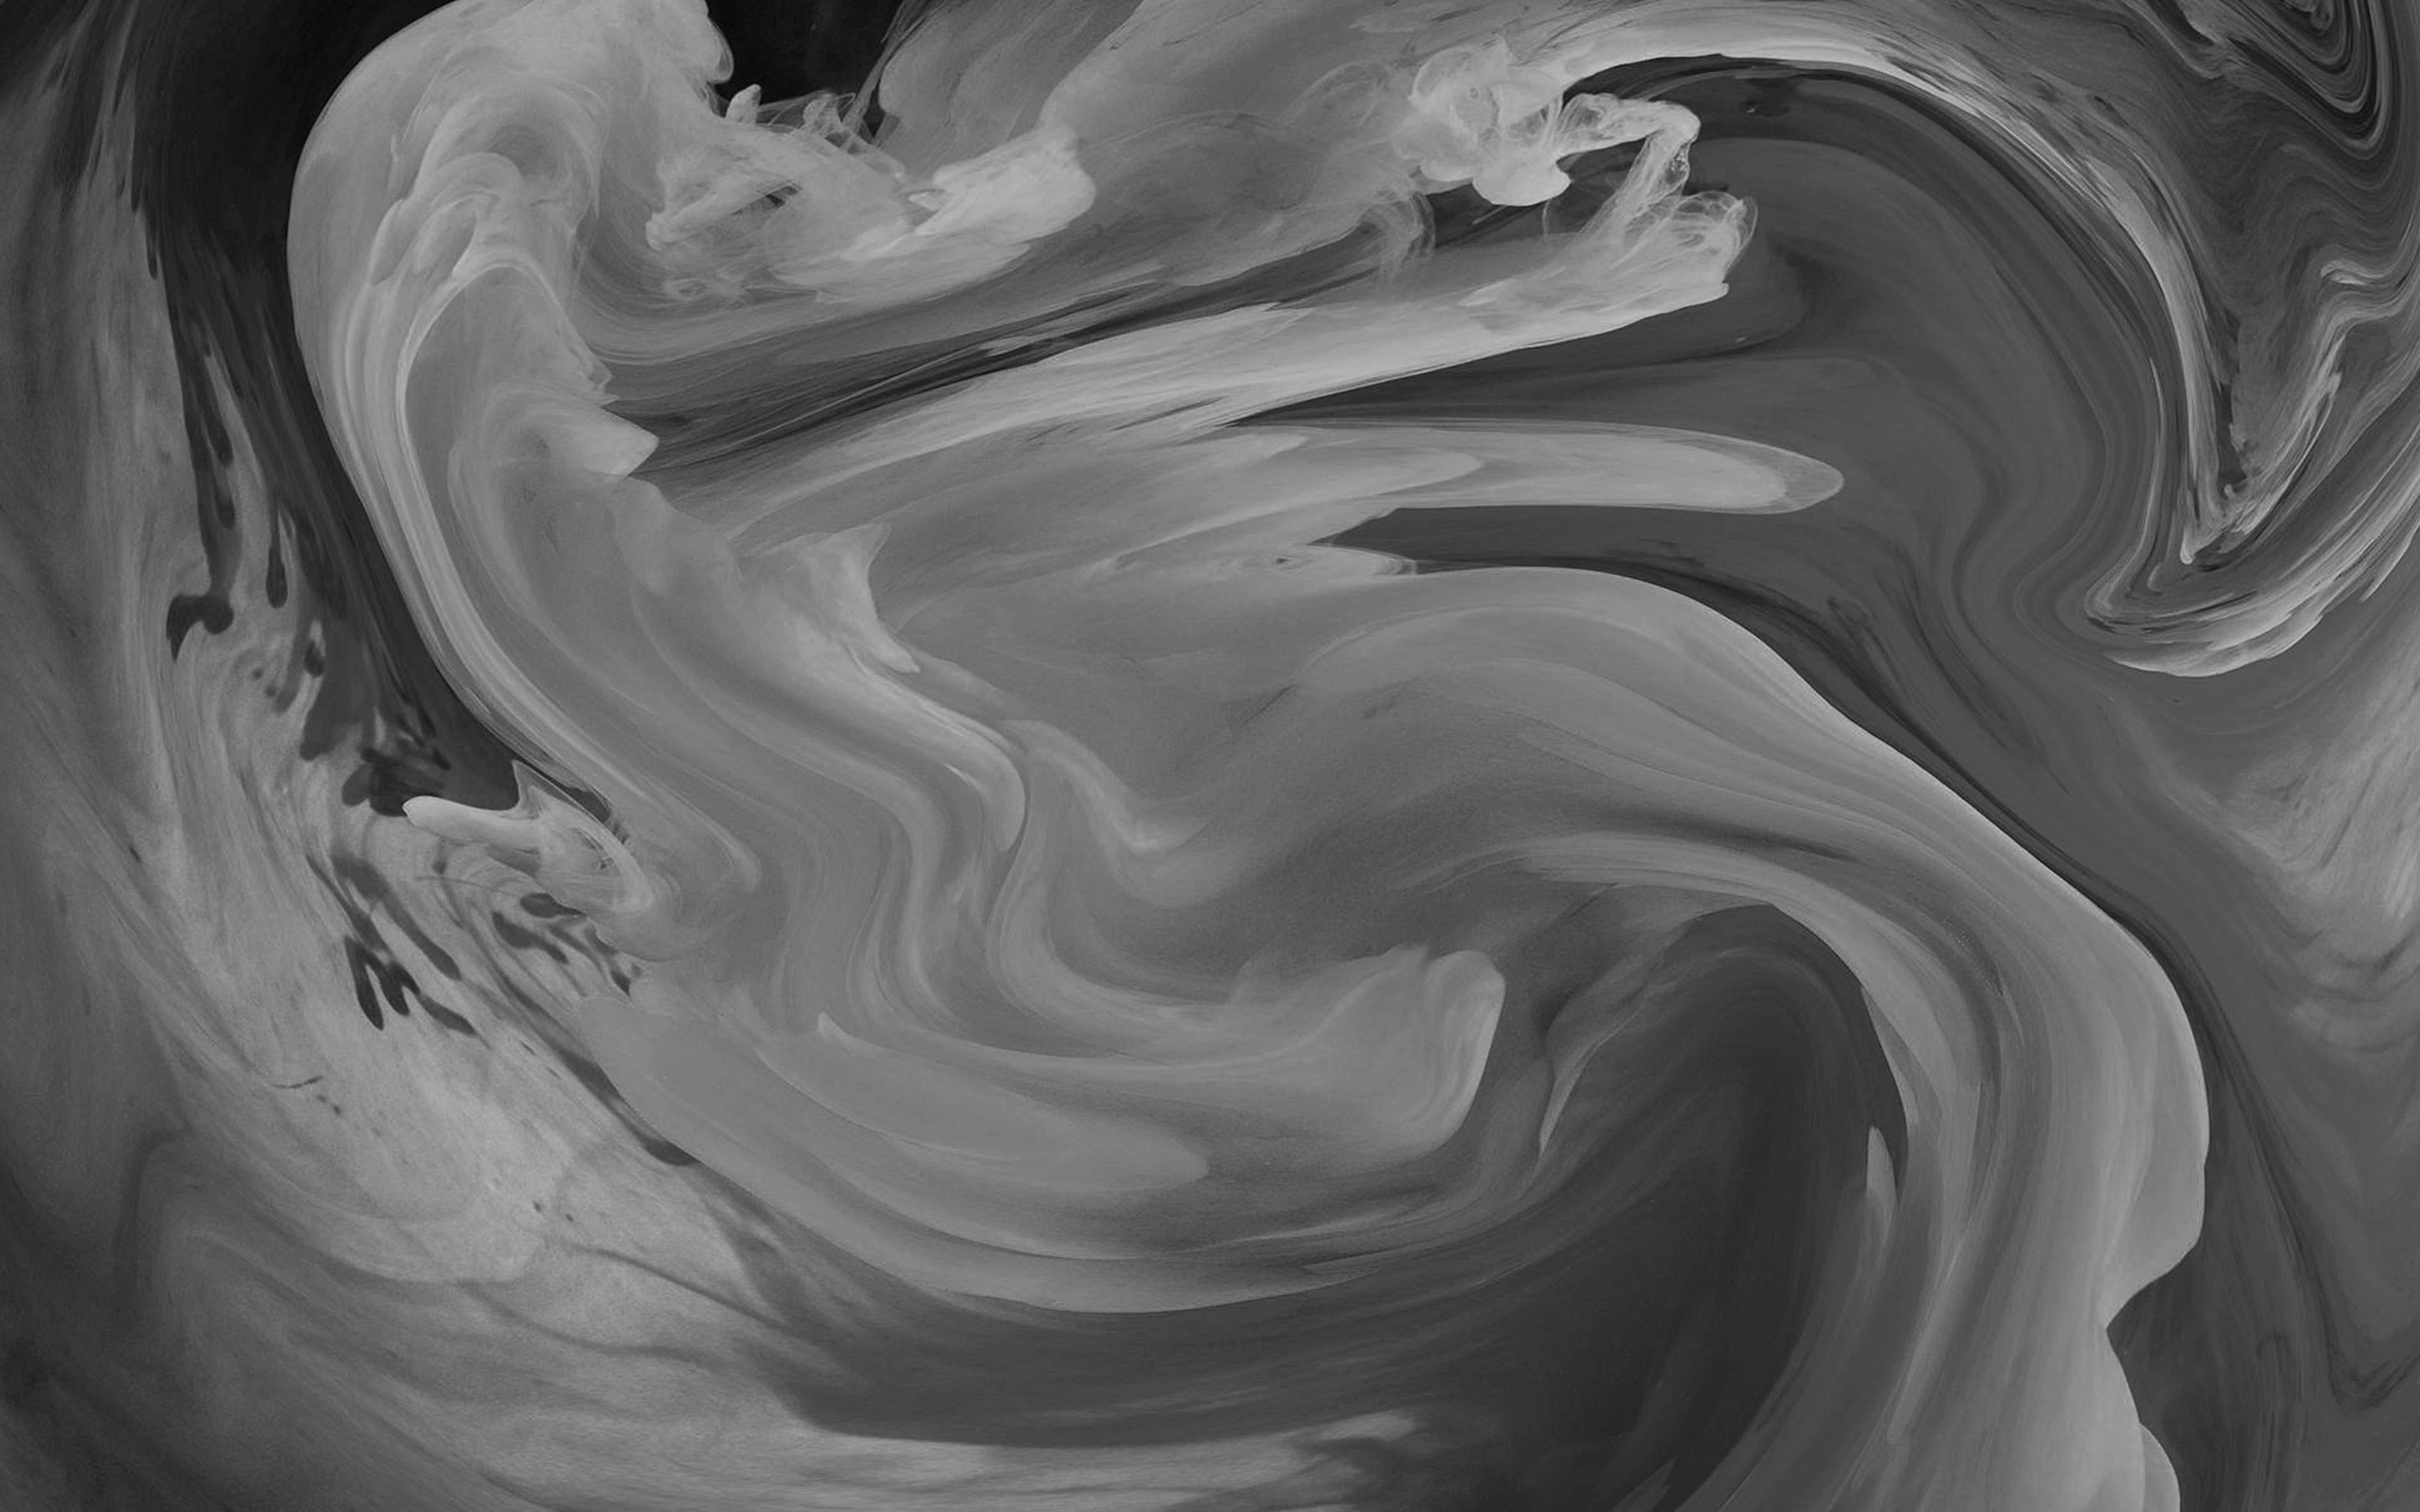 vl09-hurricane-swirl-abstract-art-paint-dark-bw-pattern ...